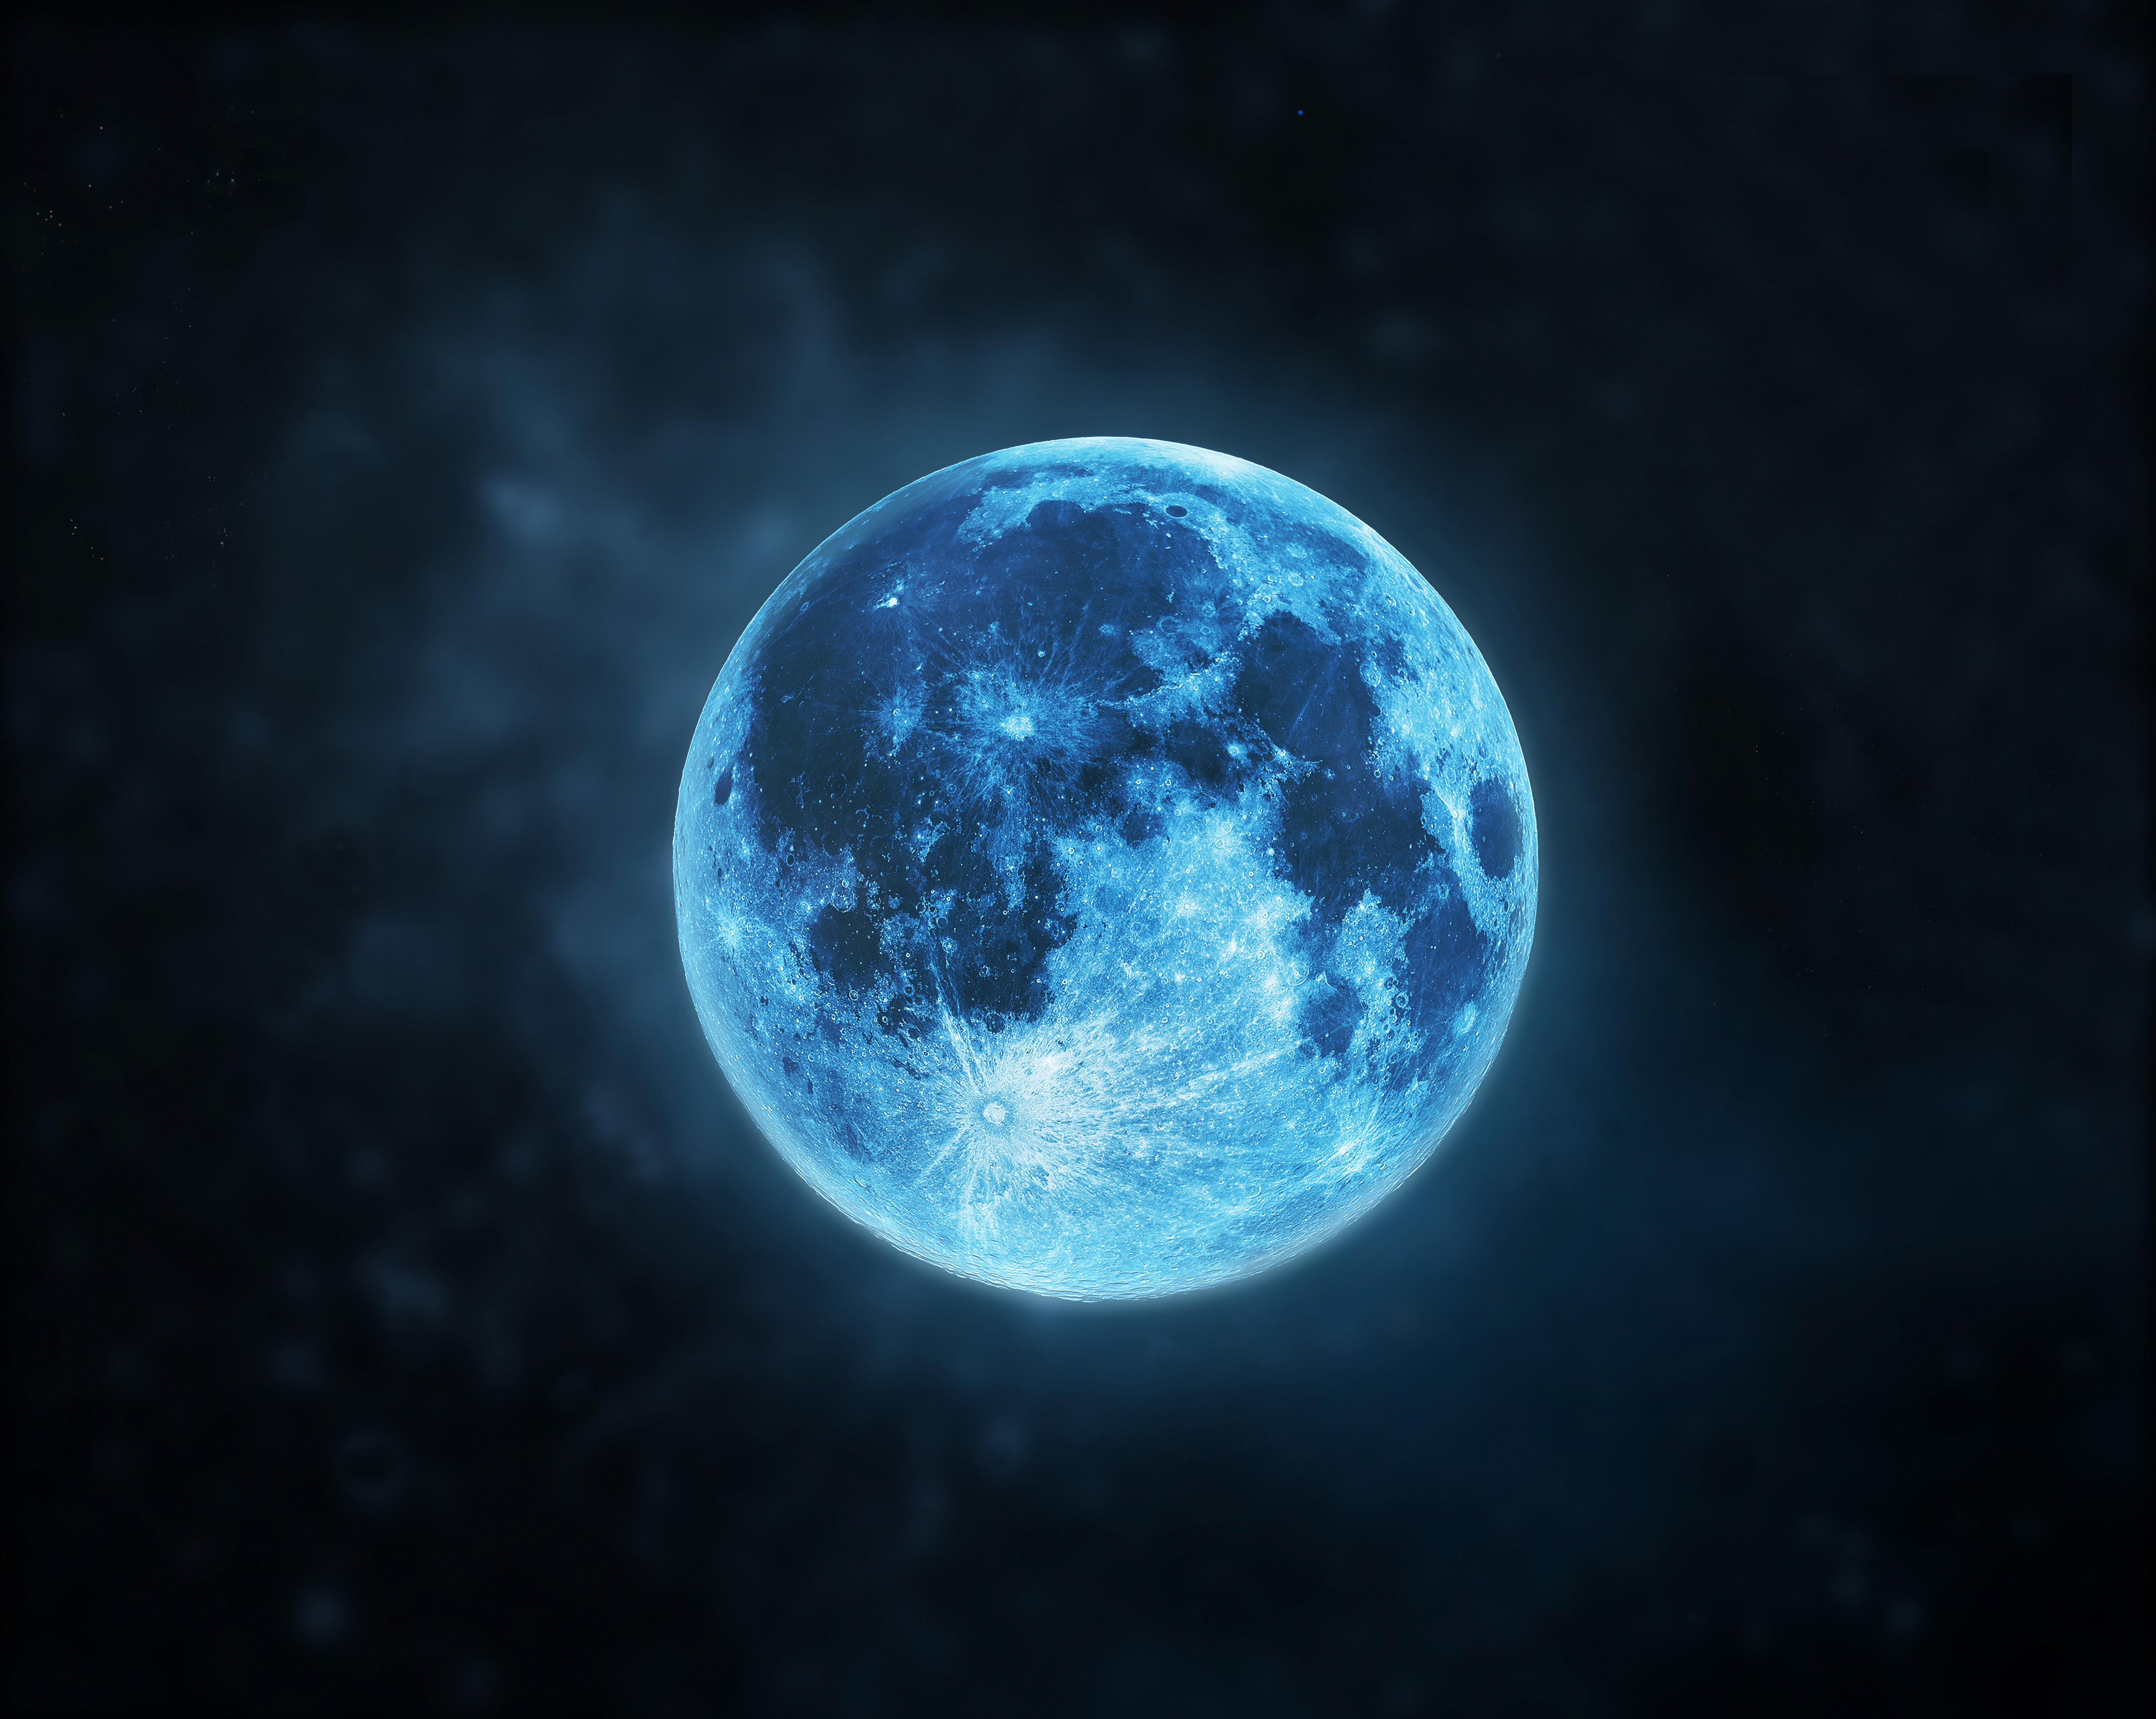 super blood moon january 2019 utah - photo #18